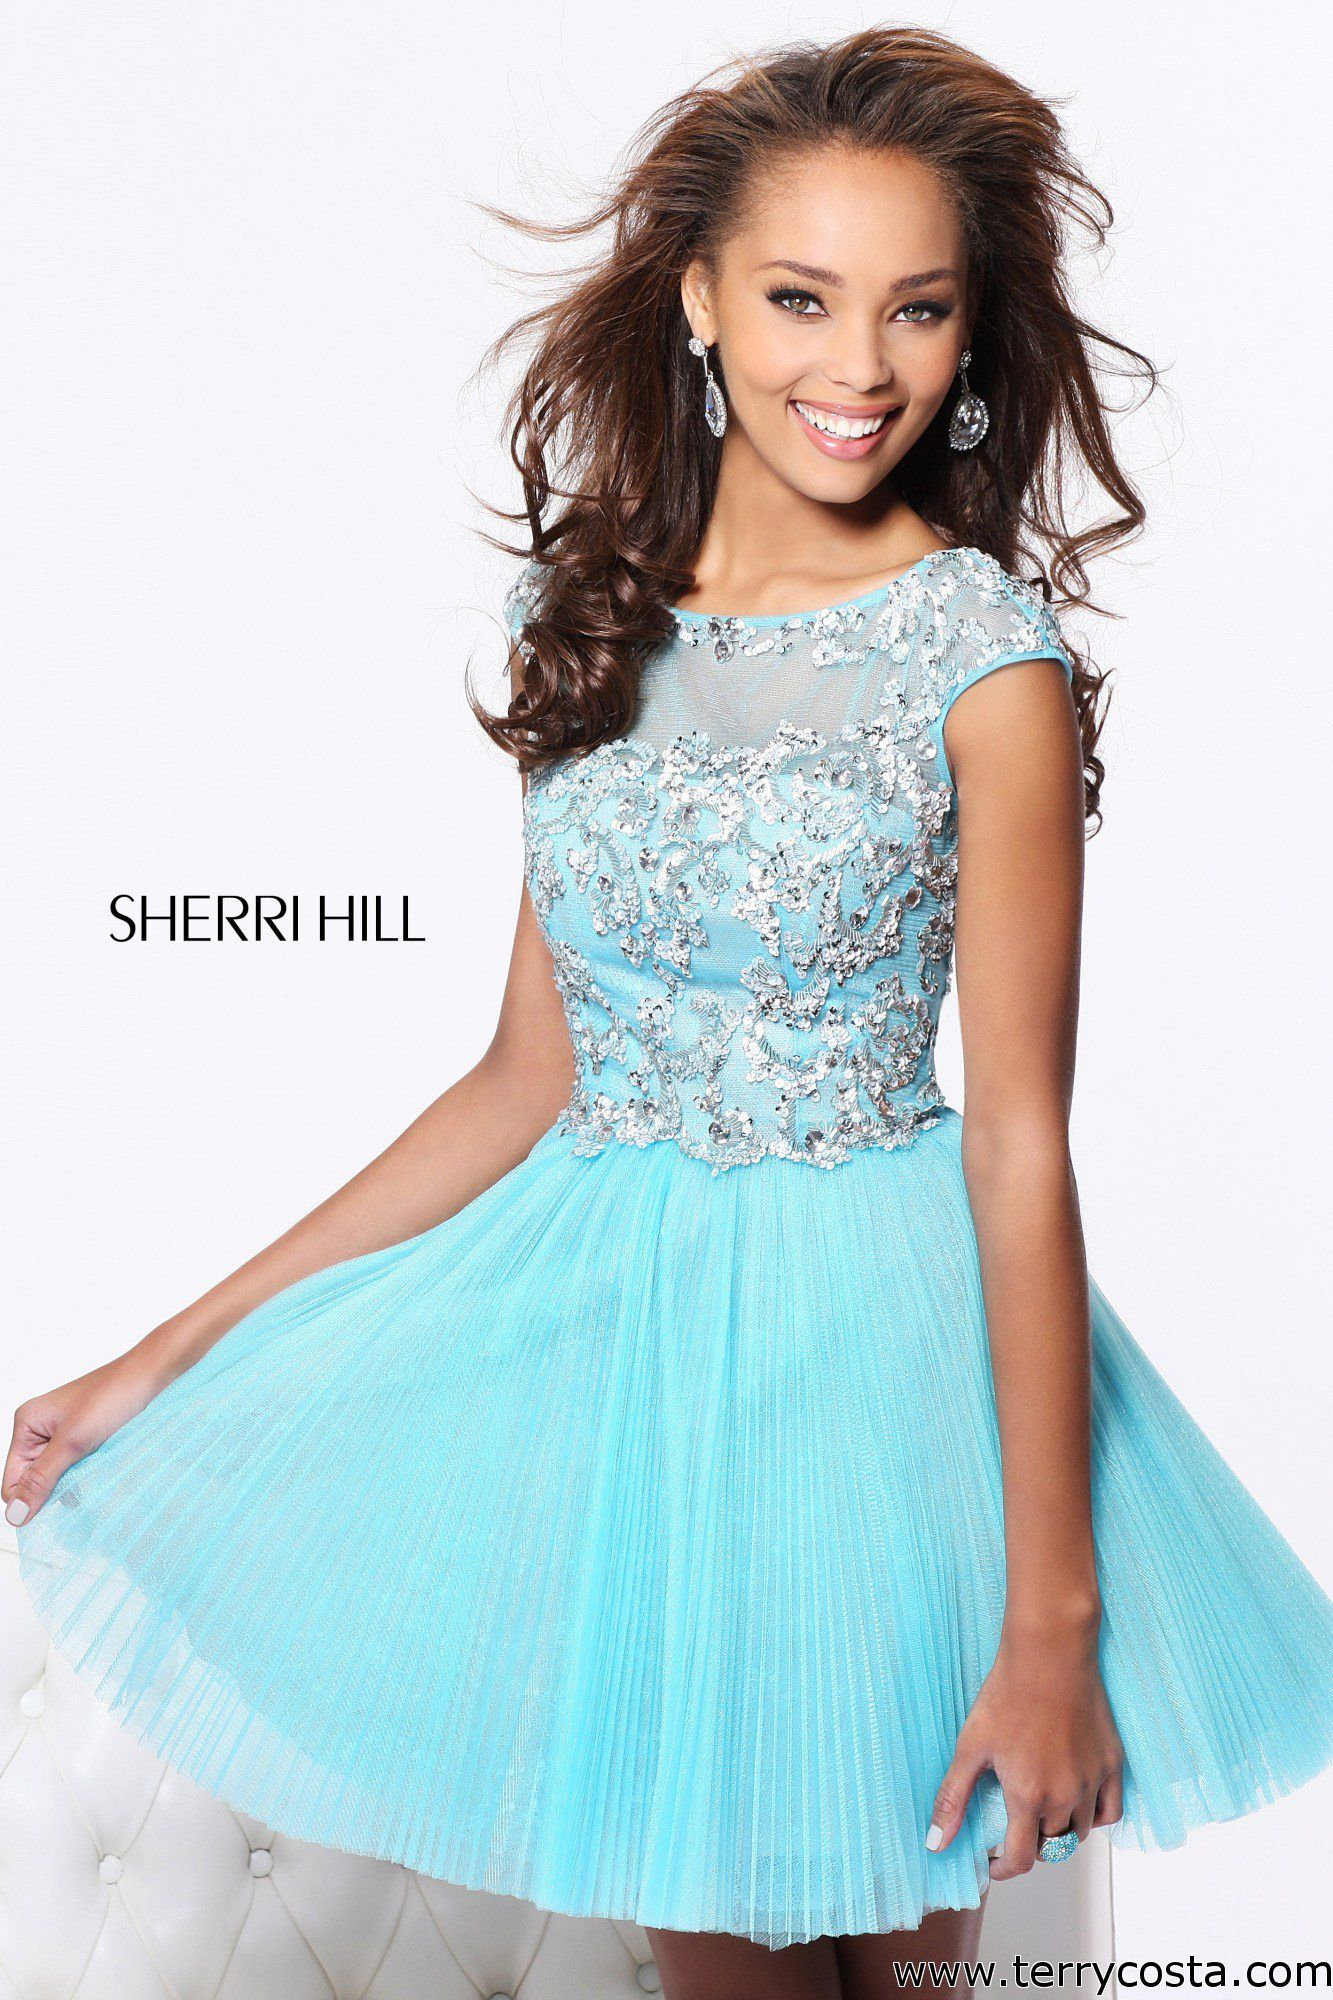 Sherri Hill 21032 on @Terry Costa - This Short Sherri Hill Dress ...